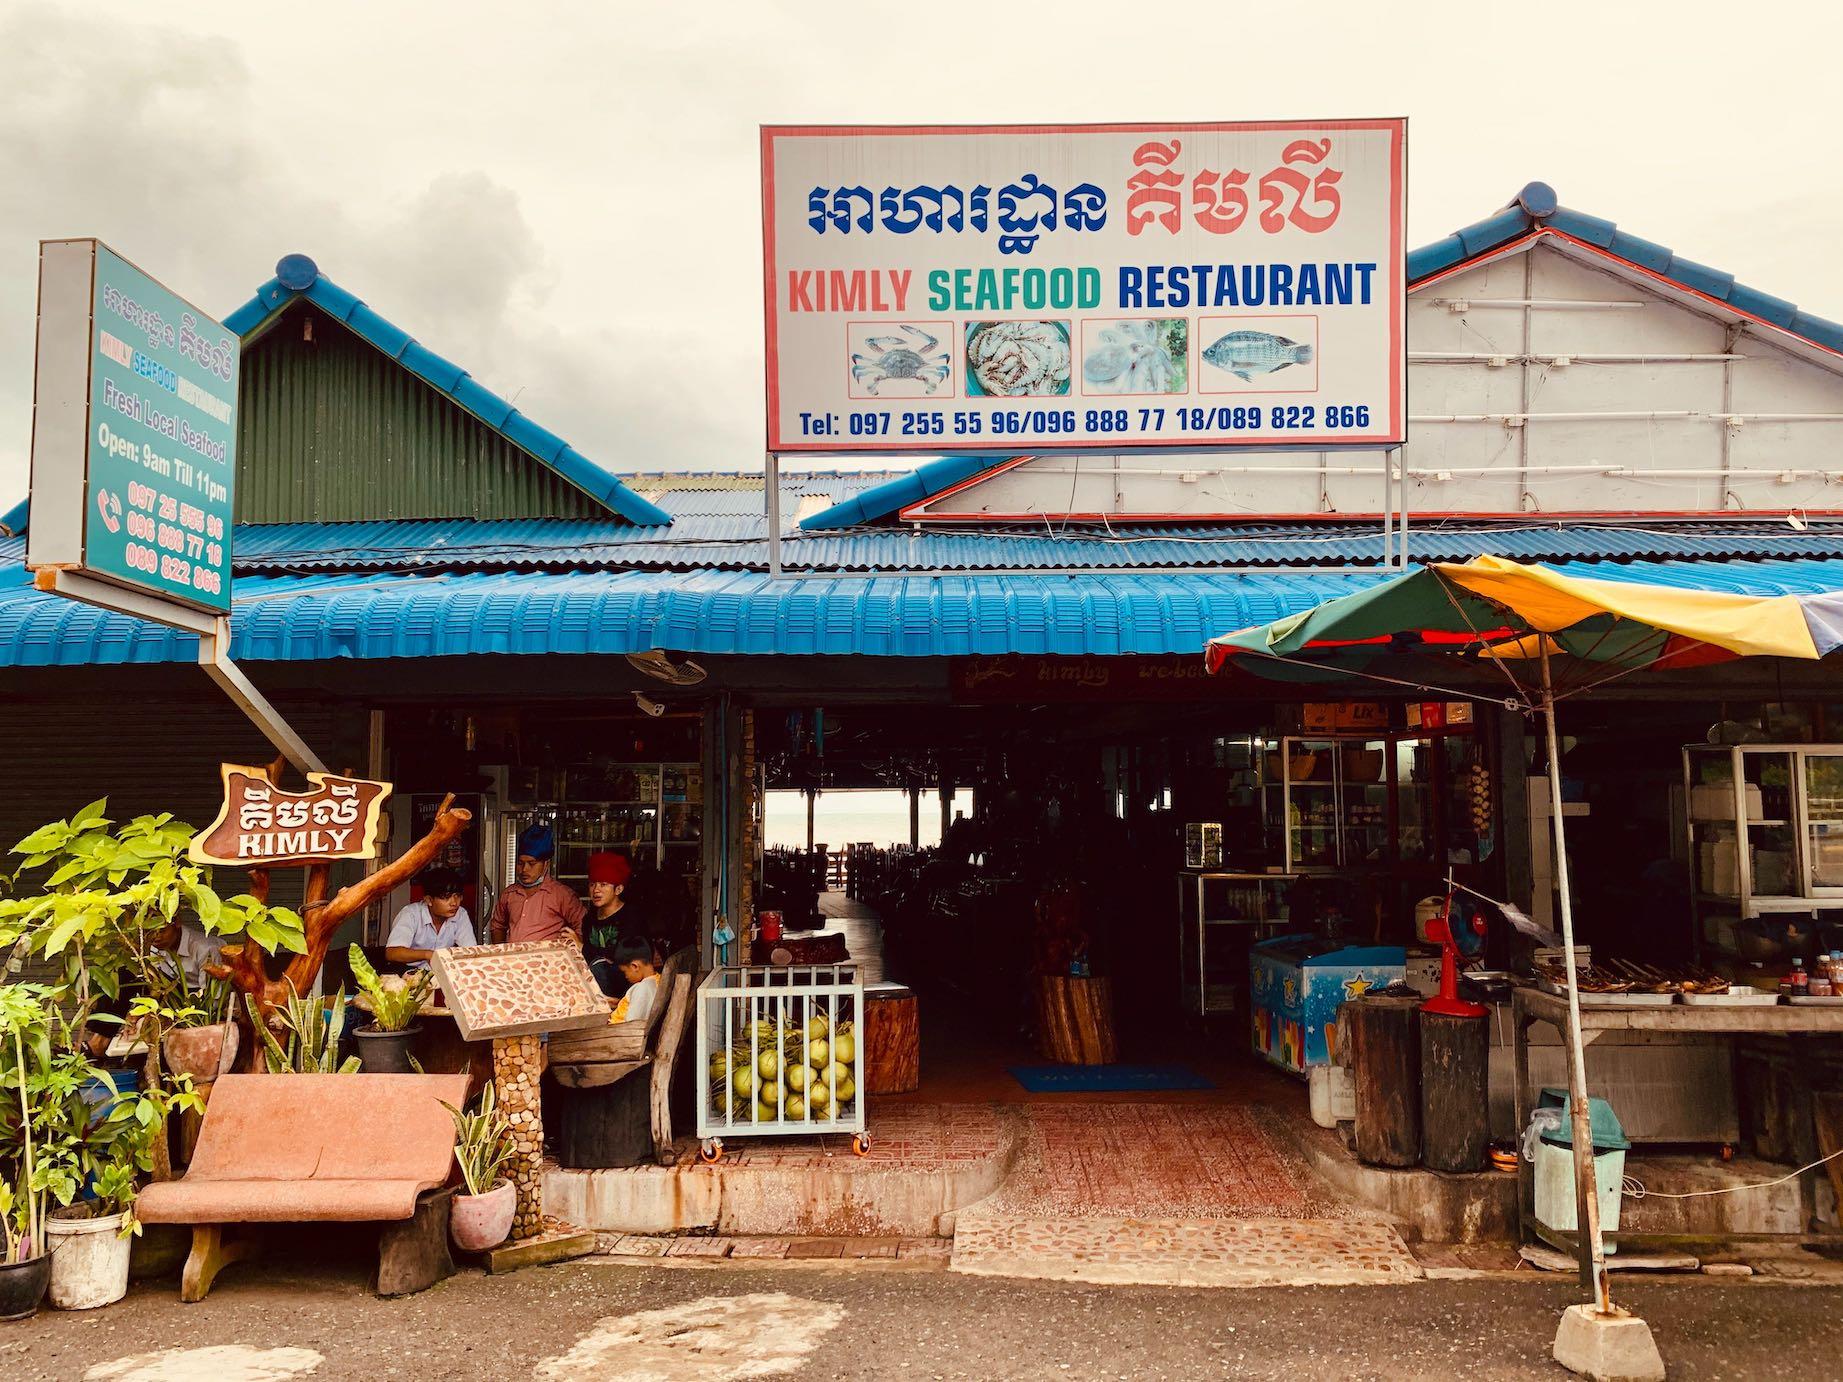 Kimly Seafood Restaurant Kep.